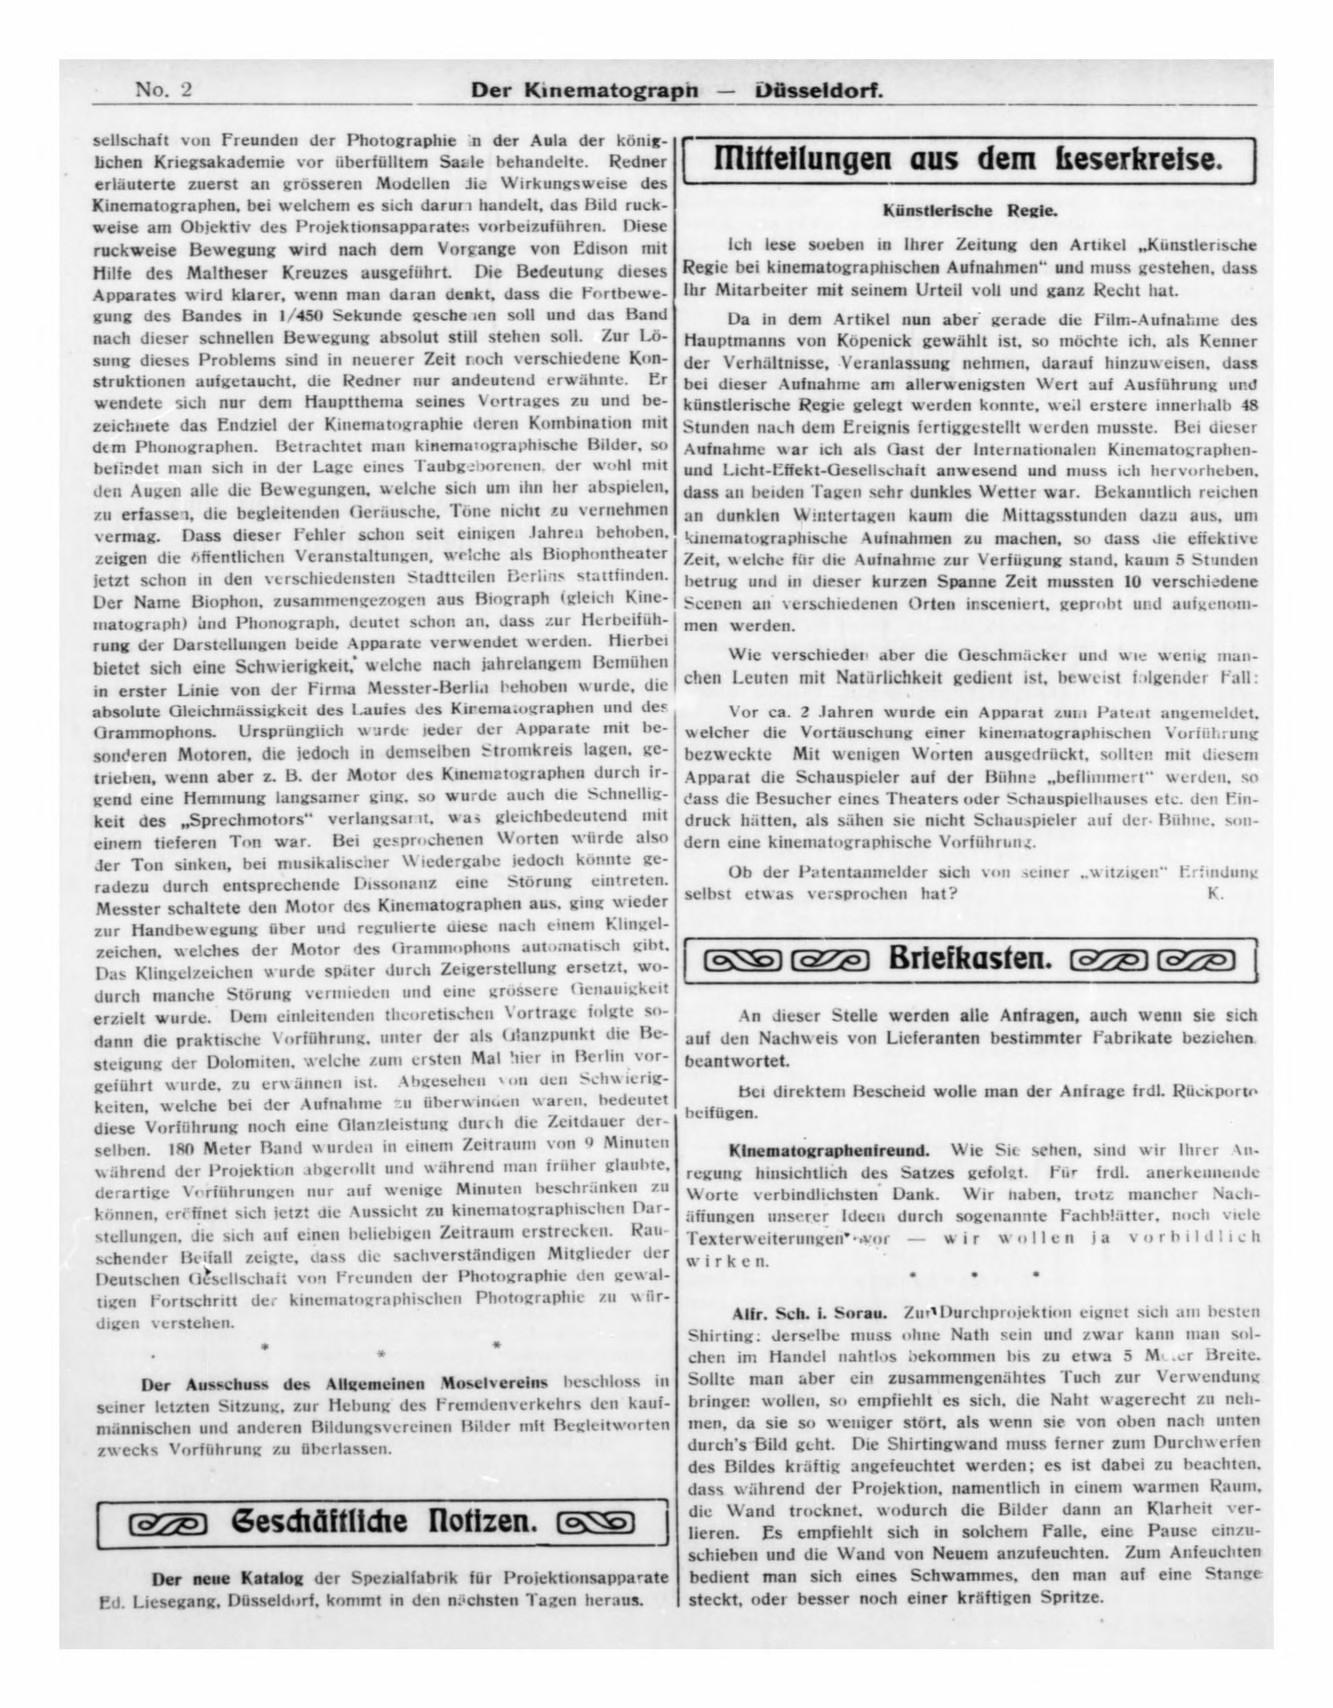 Kinematograph01-1907-01_jp2.zip&file=kinematograph01-1907-01_jp2%2fkinematograph01-1907-01_0019